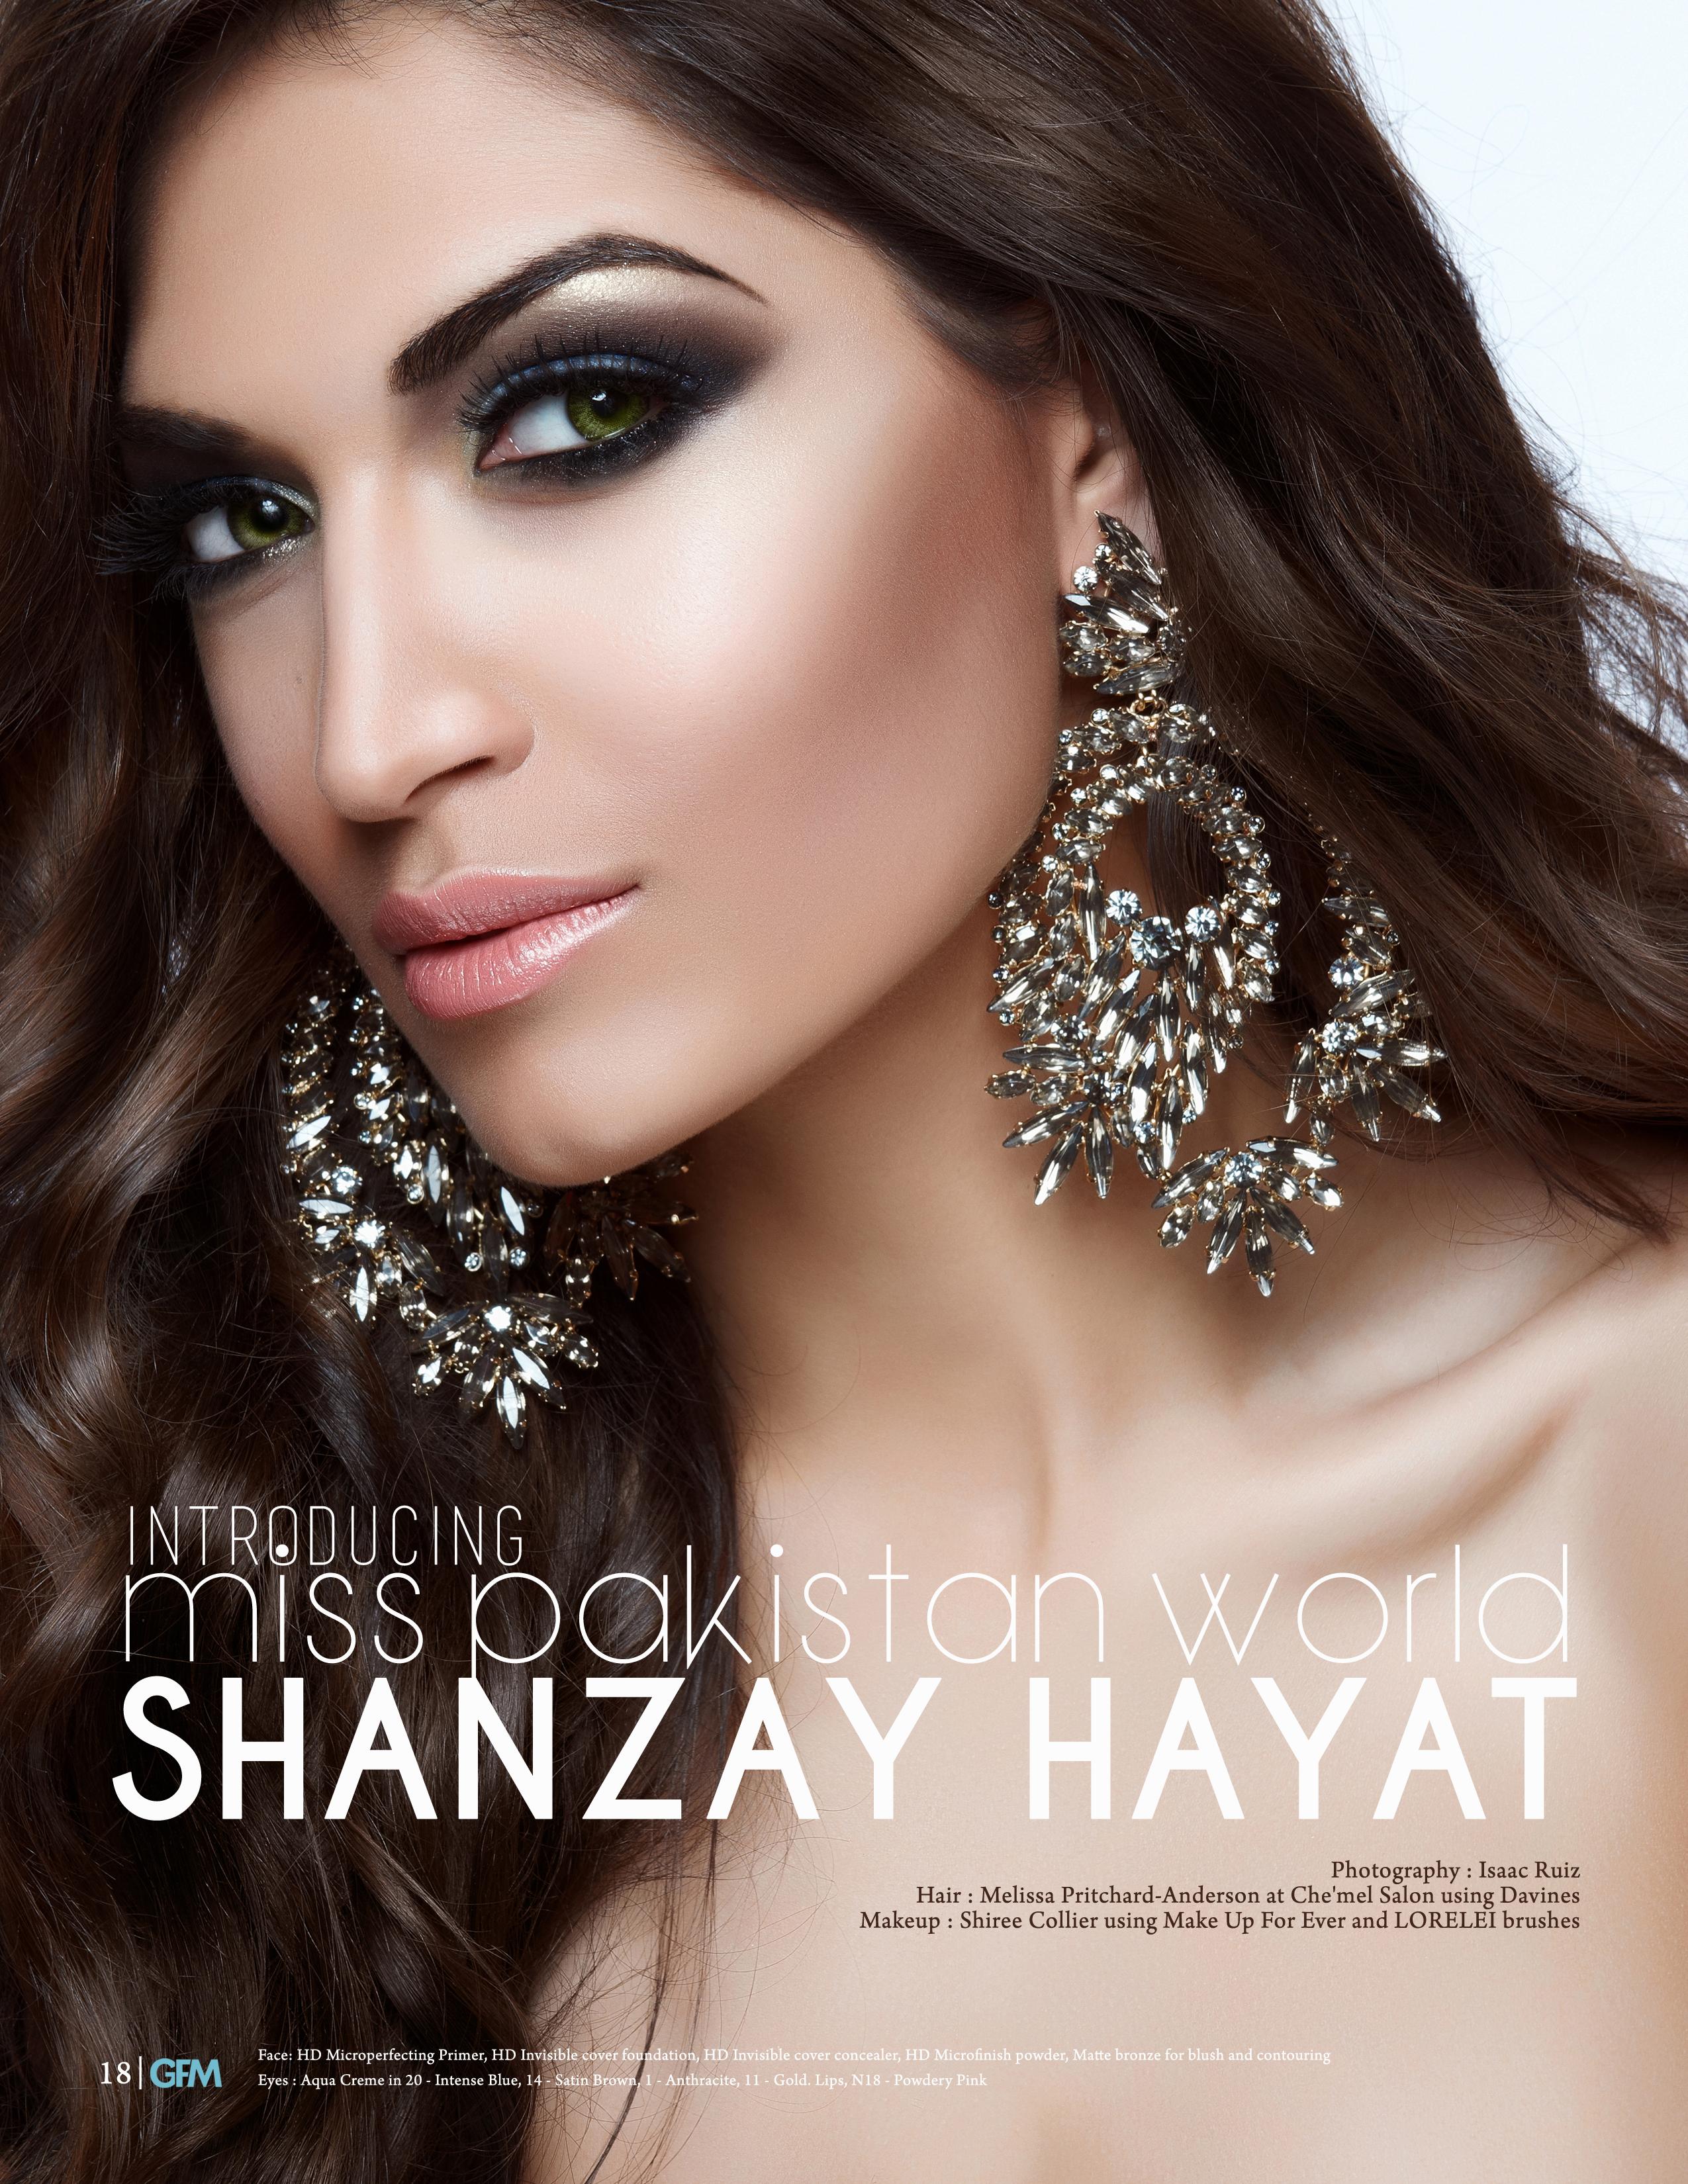 Shanzay Hayat